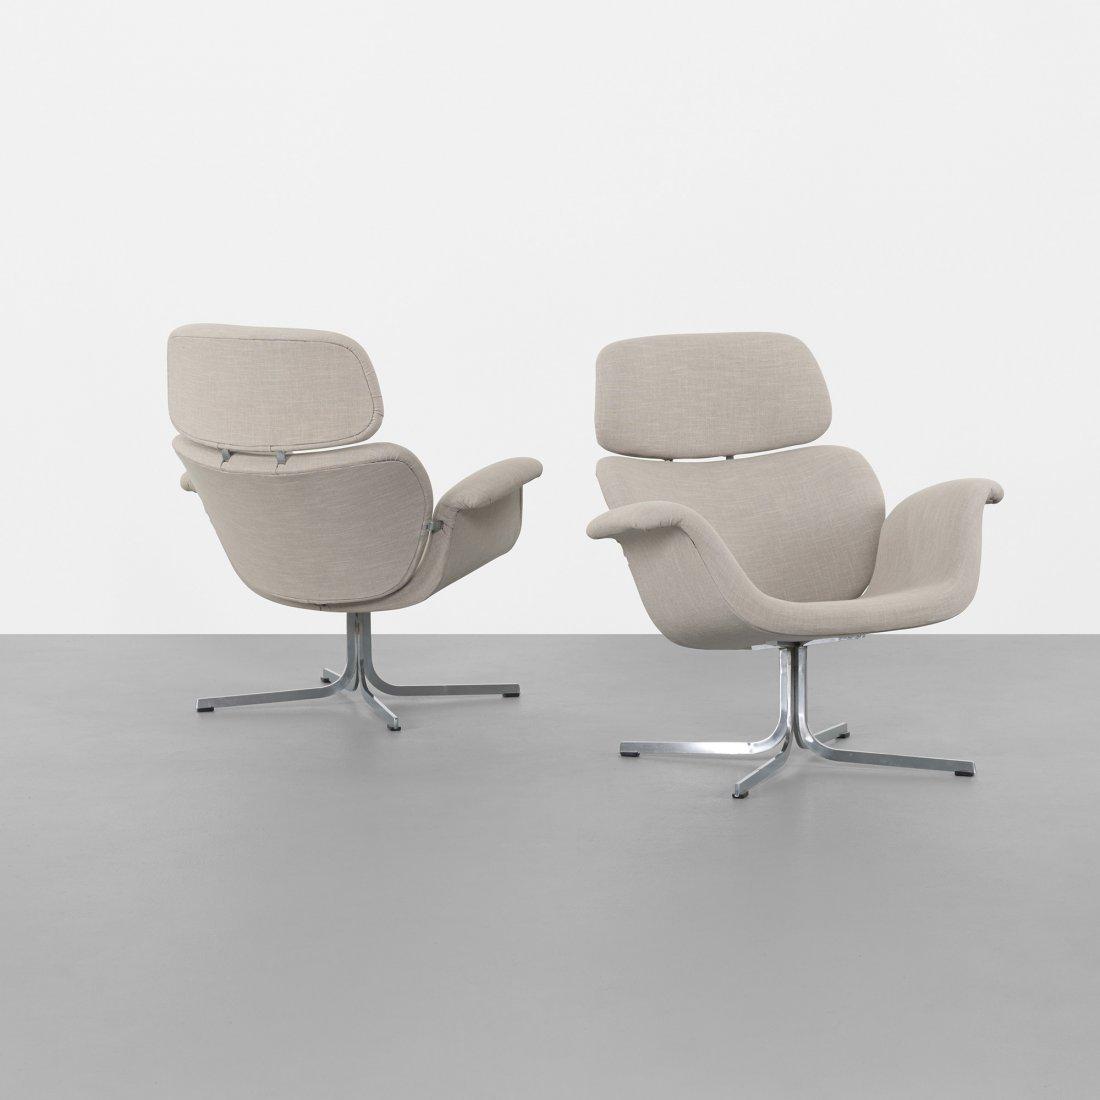 Pierre Paulin Tulip lounge chairs, pair